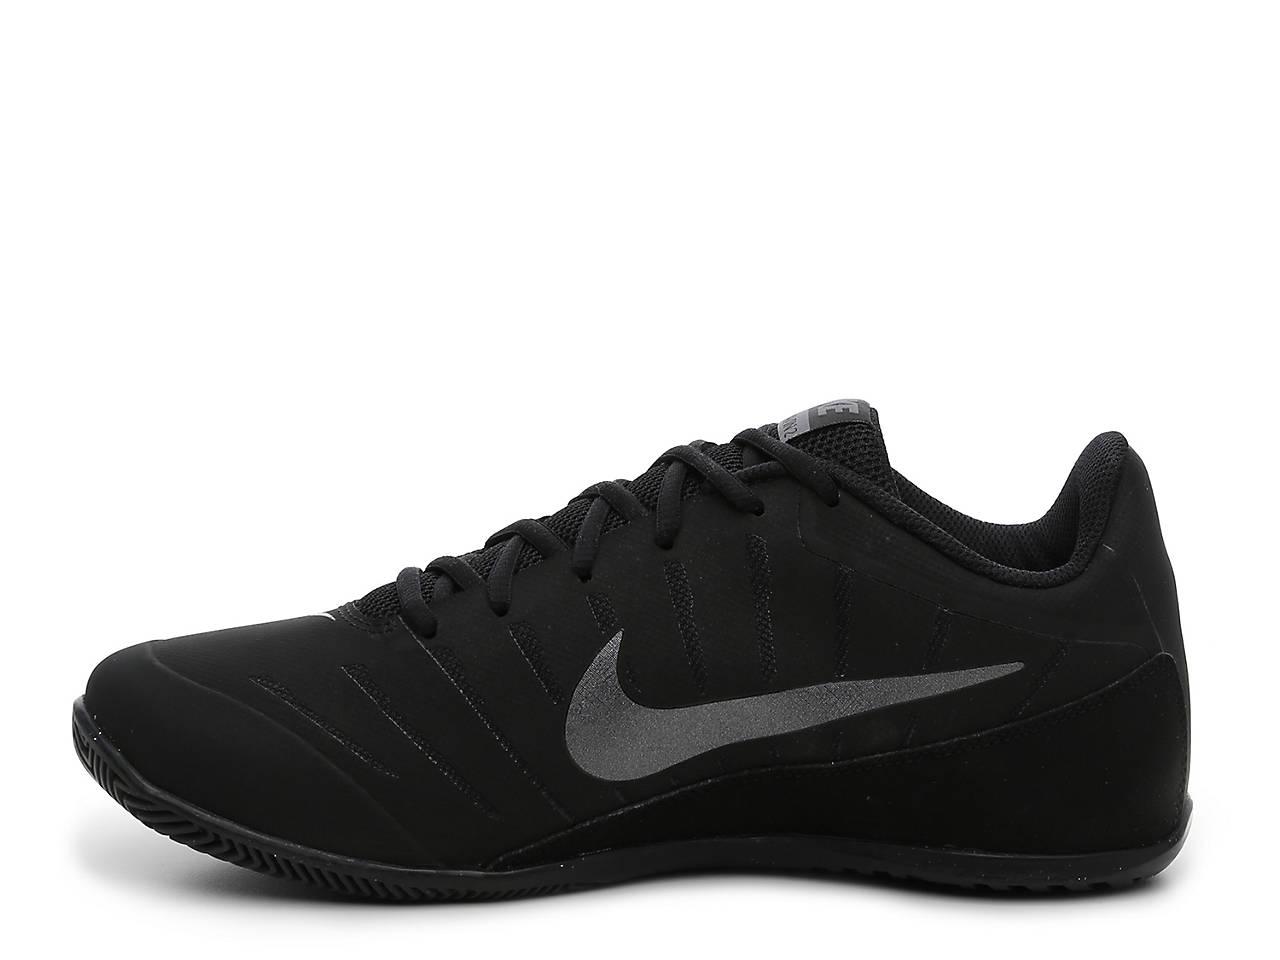 3cc8155cdc5 Nike Air Mavin 2 Basketball Shoe - Men s Men s Shoes